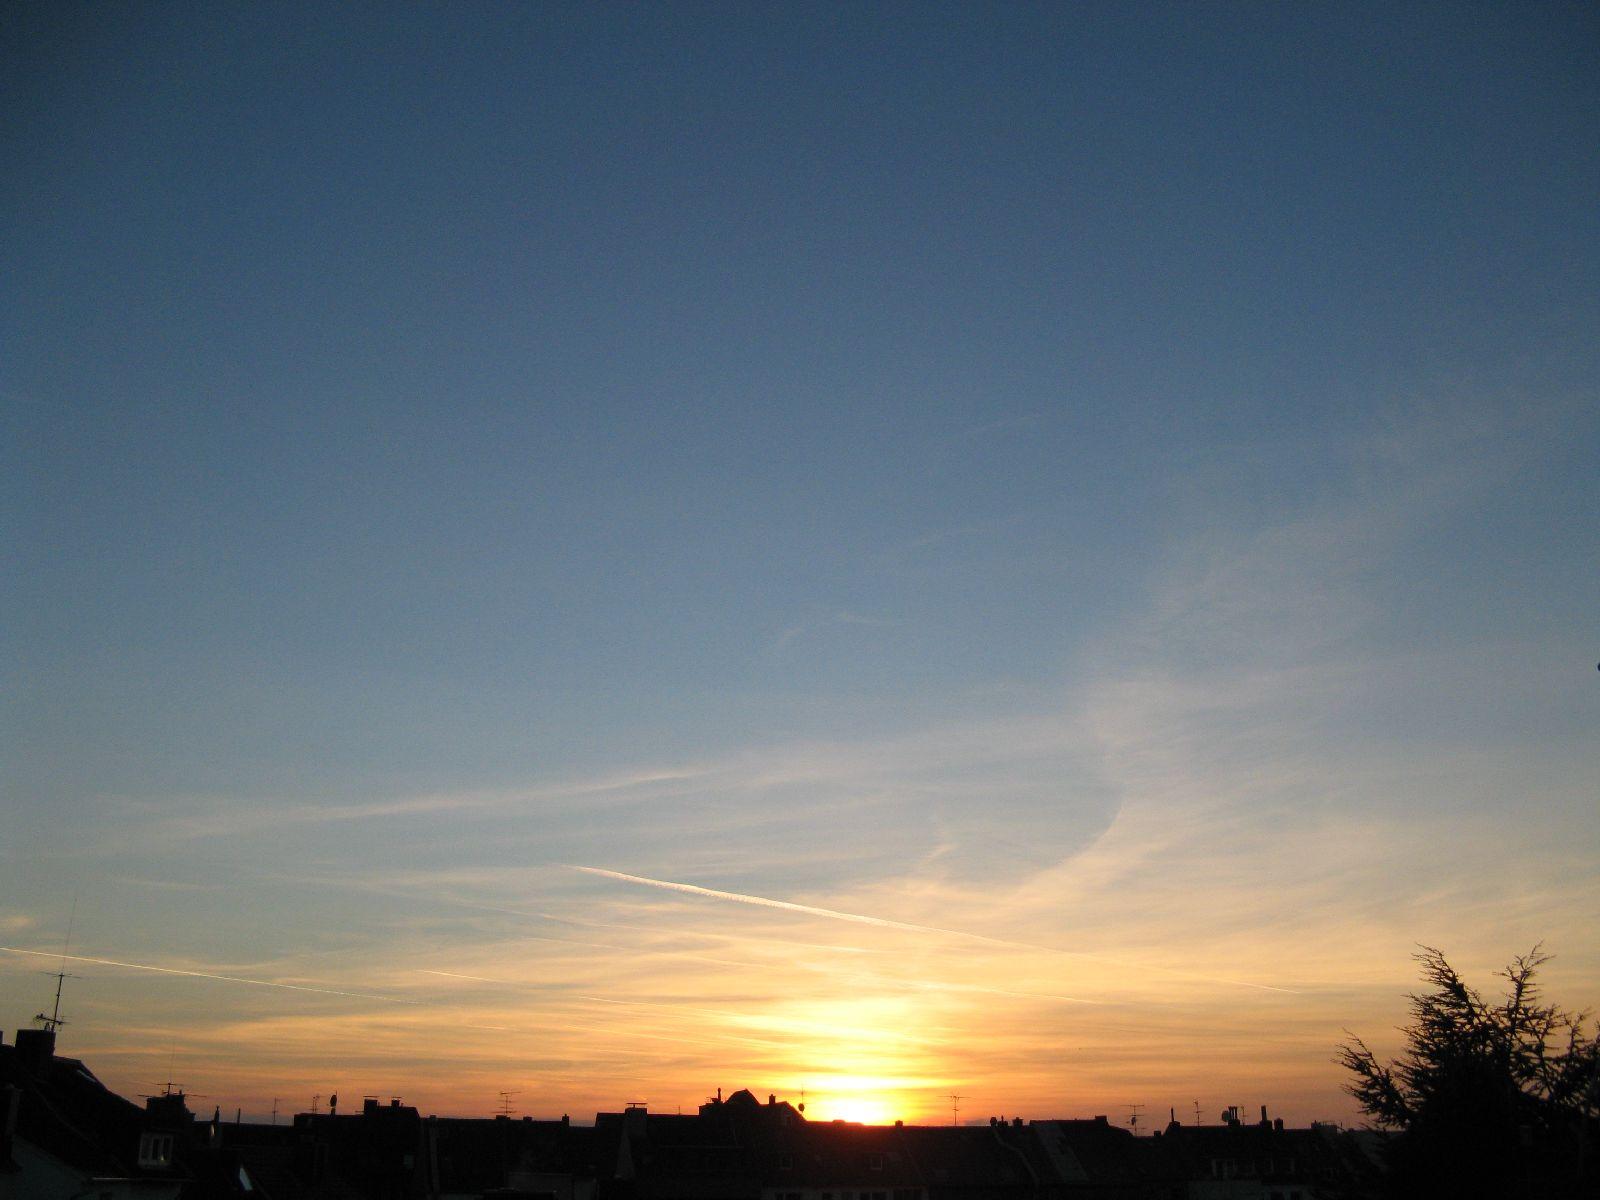 Himmel-Wolken-Foto_Textur_B_3392